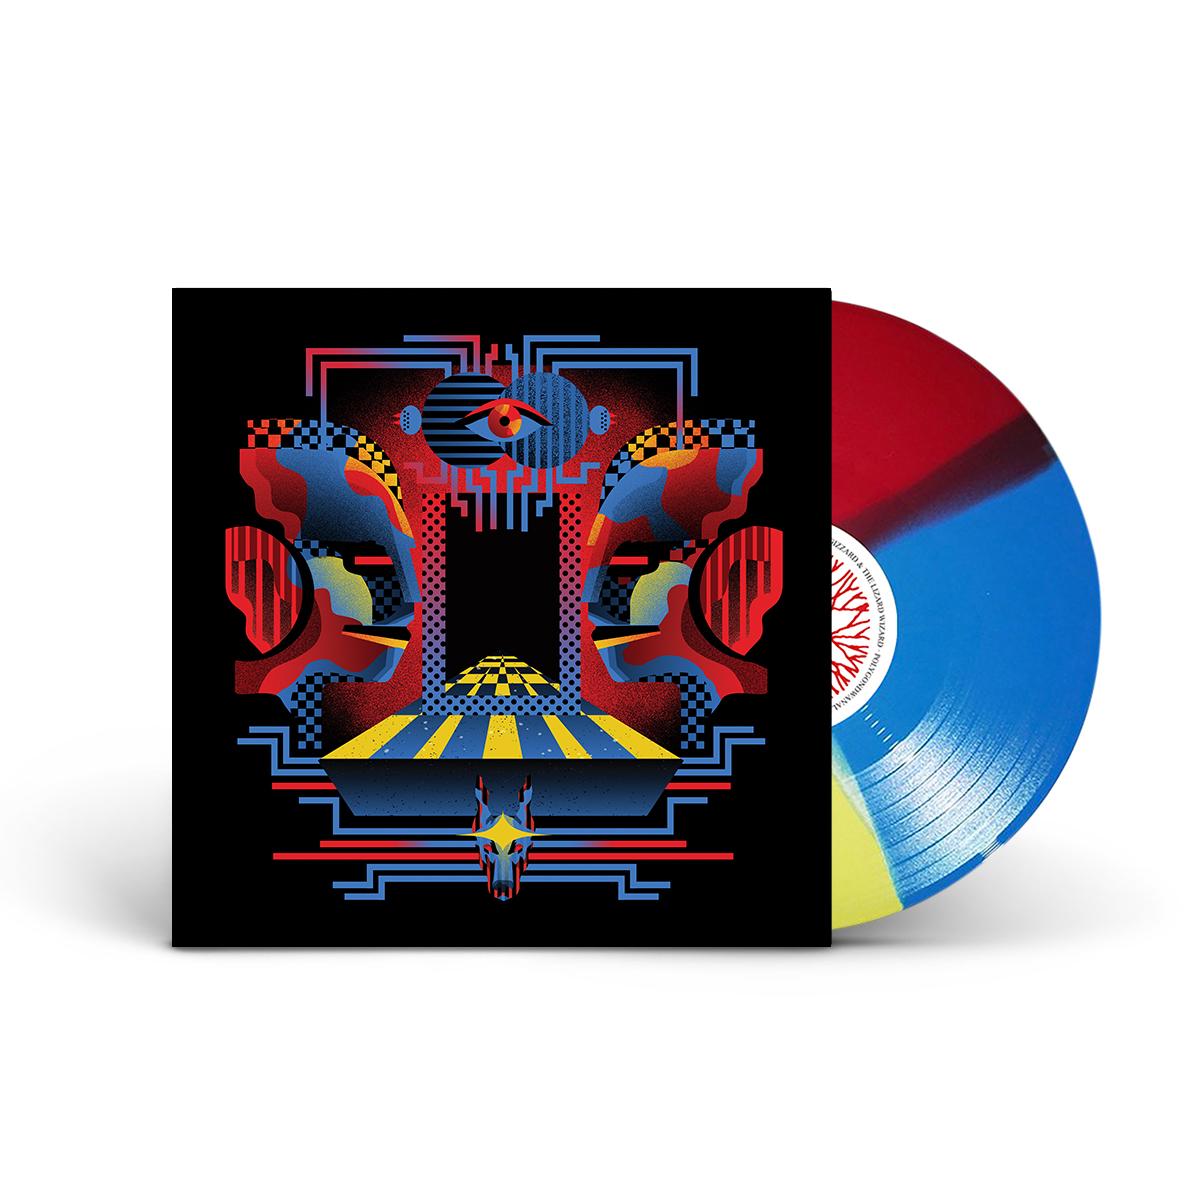 "King Gizzard & the Lizard Wizard - Polygondwanaland""Tri-Color"" Vinyl"